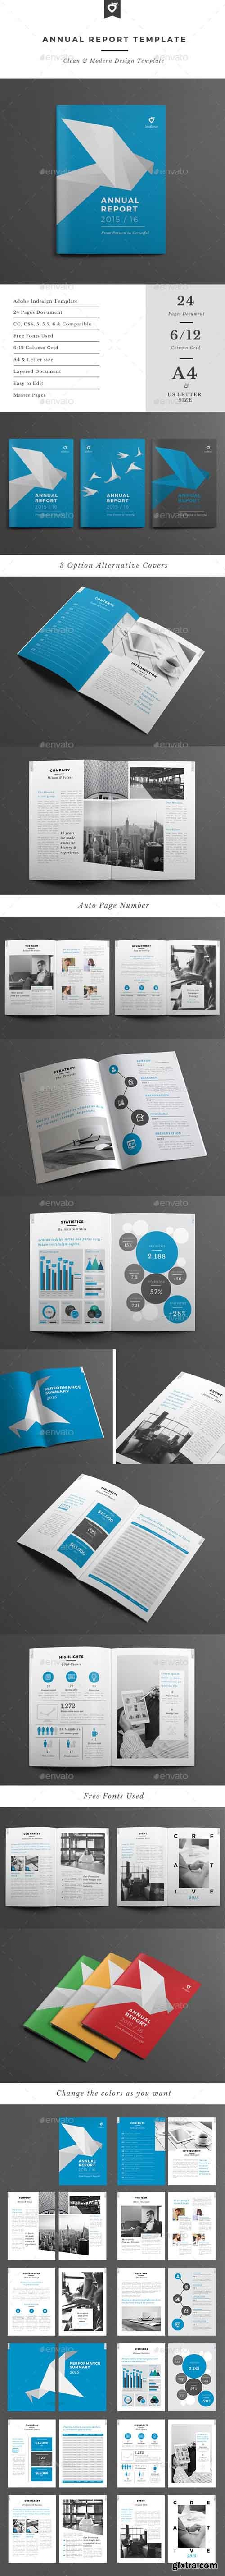 GR - Annual Report 12704622